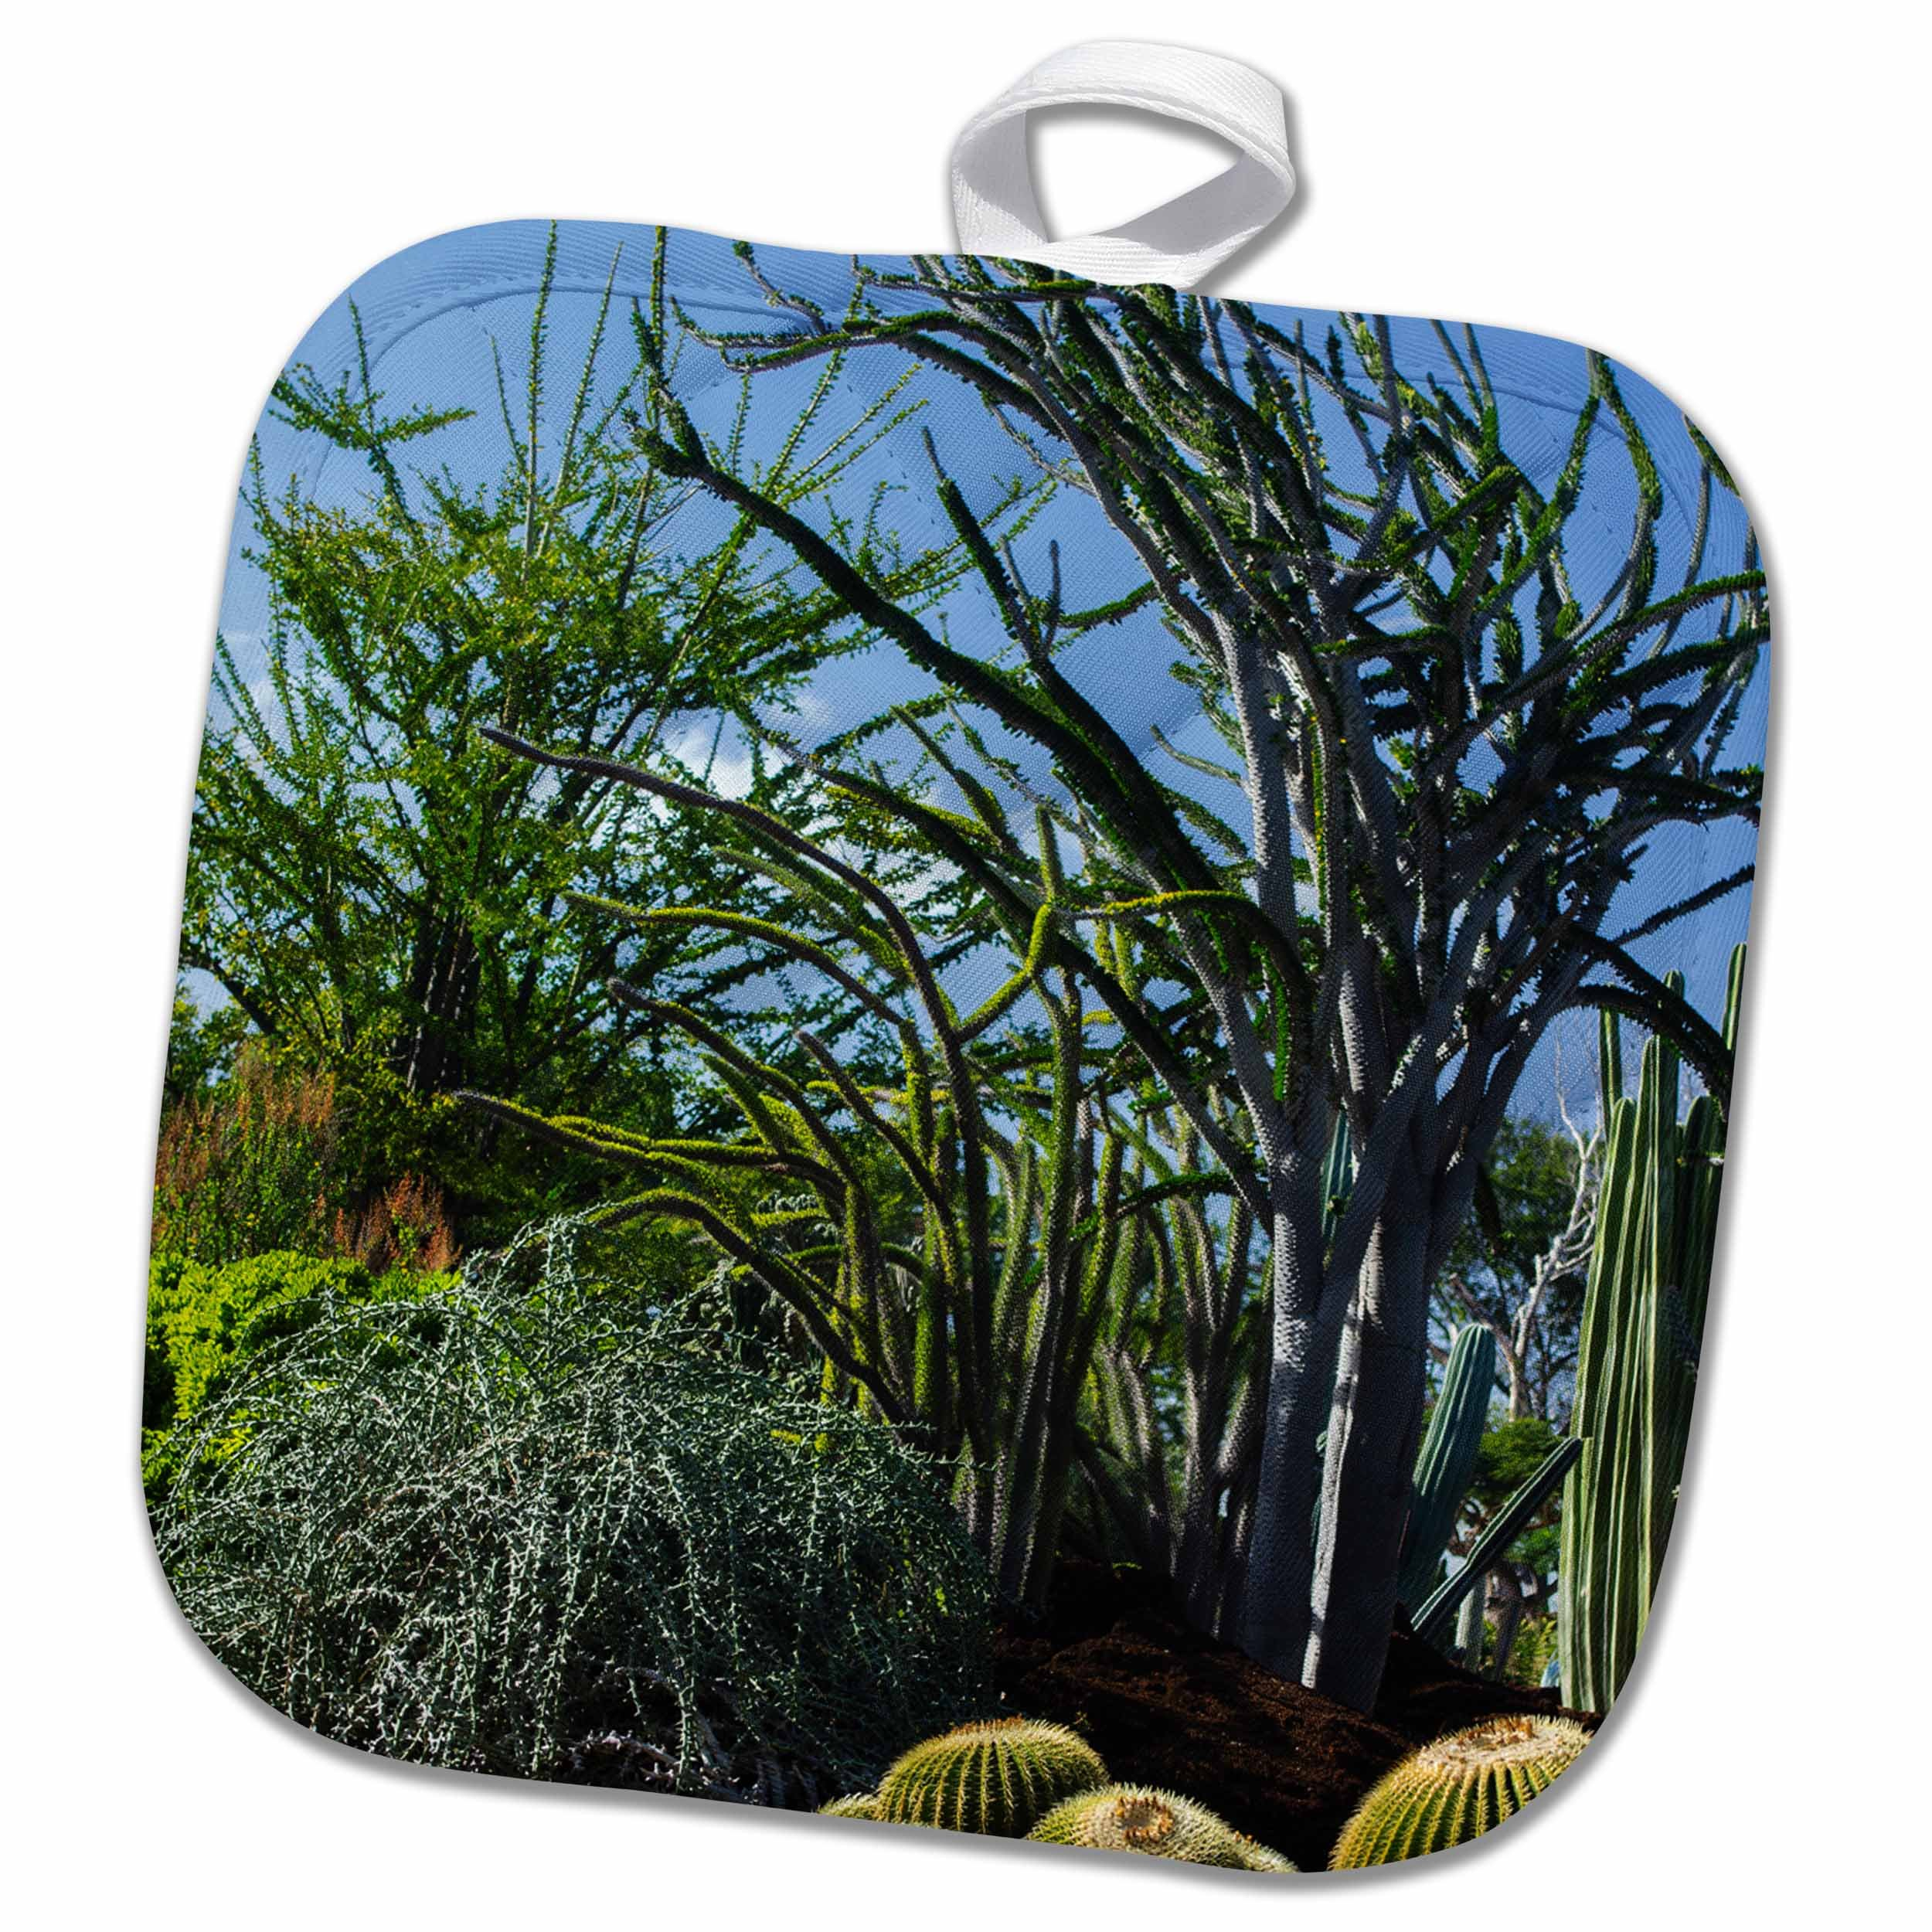 3dRose Danita Delimont - Honolulu - Hawaii, Oahu, Honolulu. Cactus garden at Kapiolani Community College. - 8x8 Potholder (phl_250790_1)